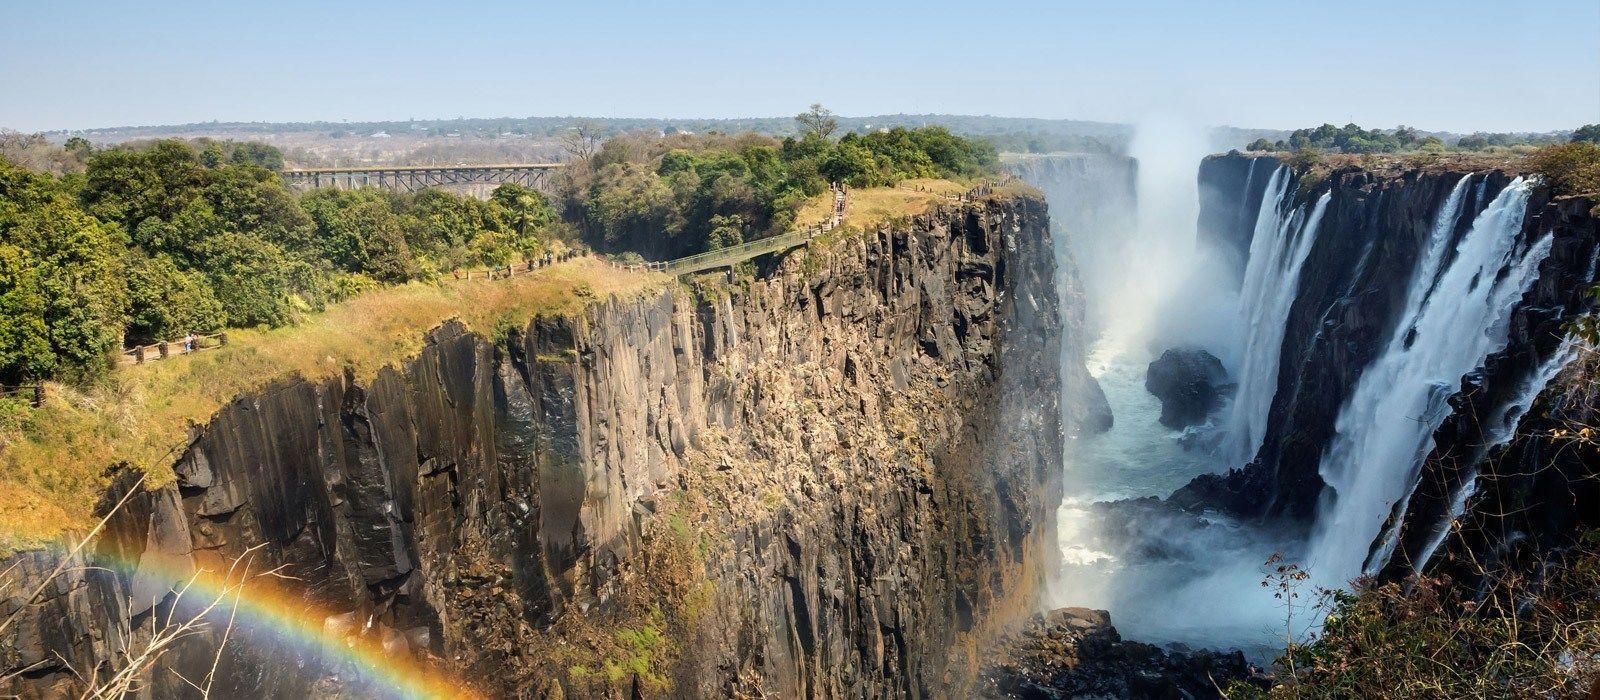 Südafrika, Sambia & Botswana: Safaris, Wein und Wasserfälle Urlaub 7